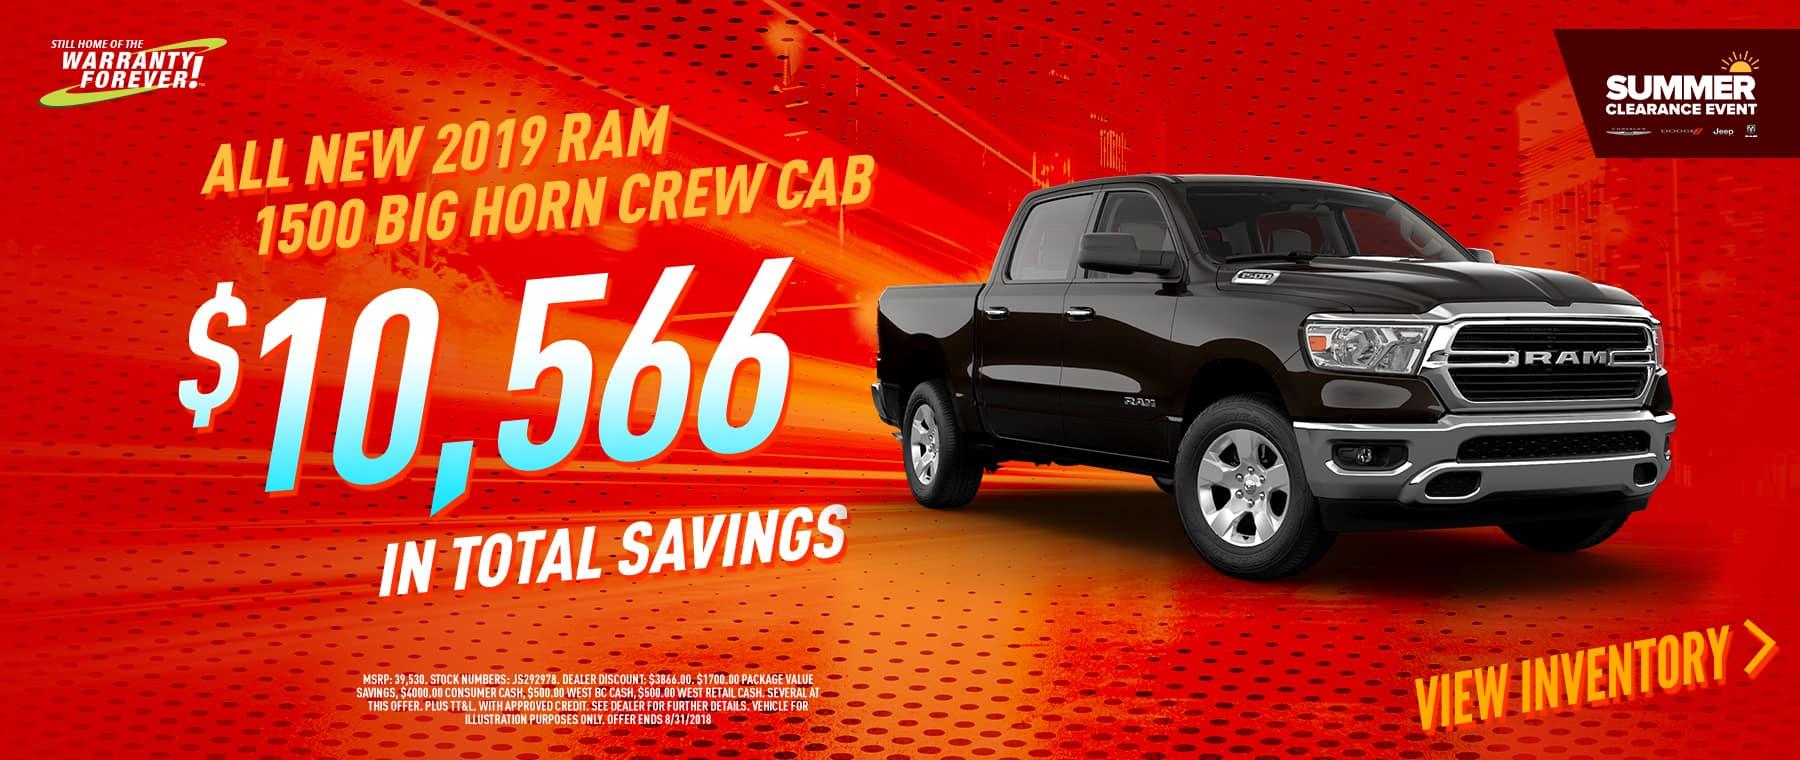 lease-2019-ram-big-horn-crew-cab